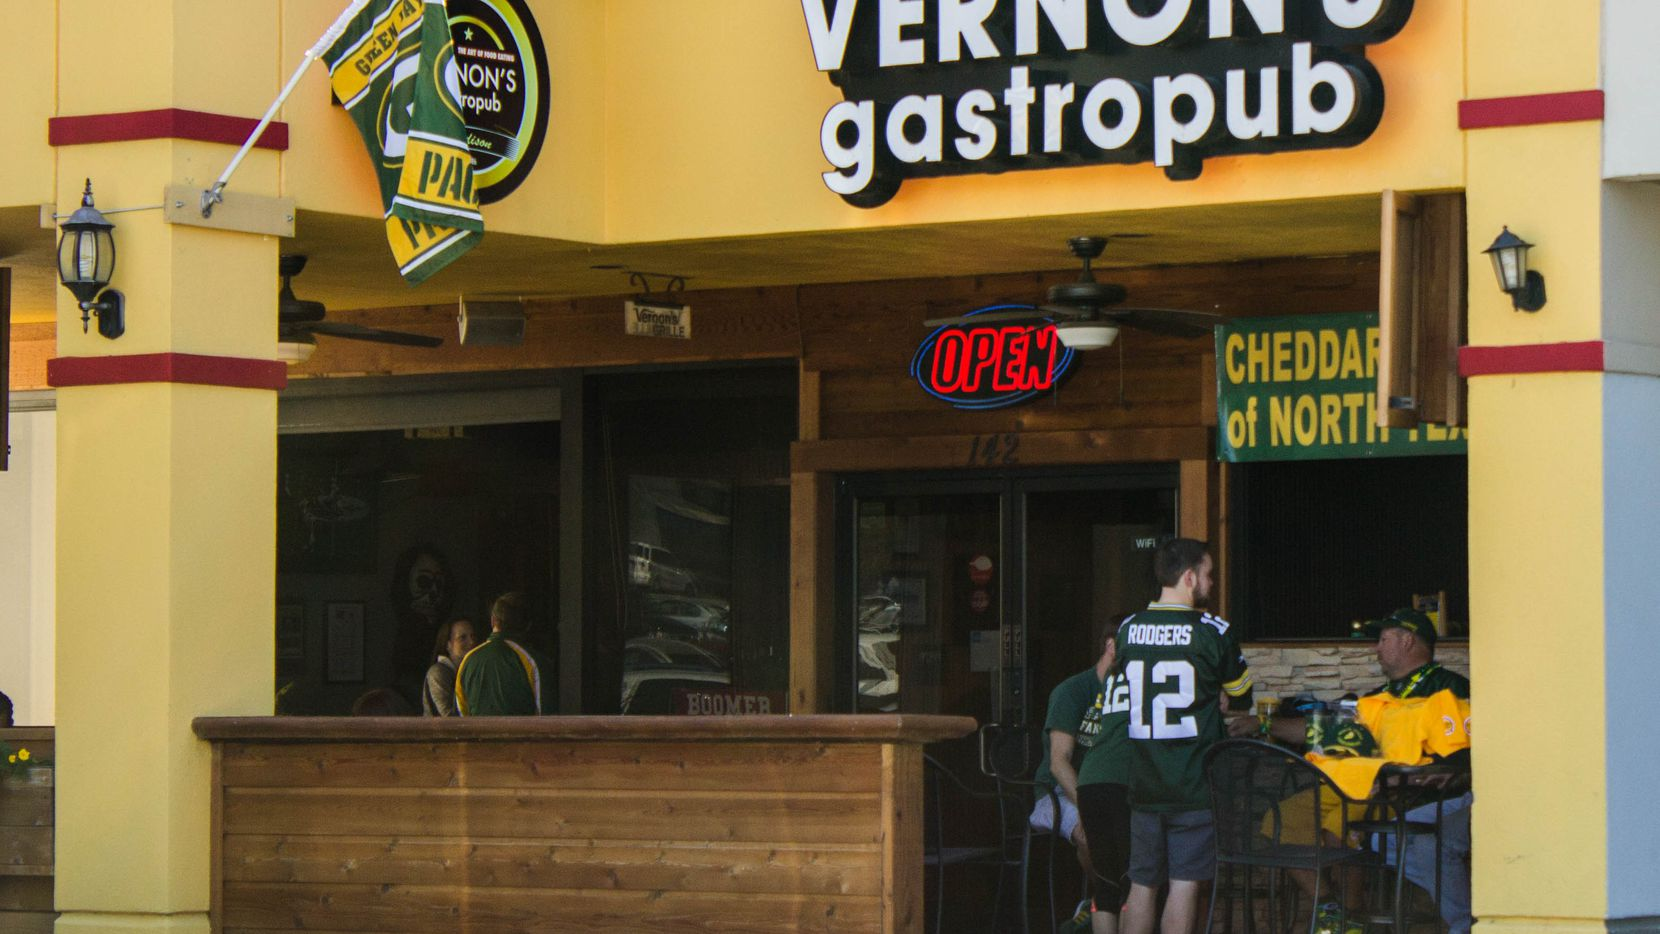 Vernon's Gastropub is located on Belt Line Road in Addison.